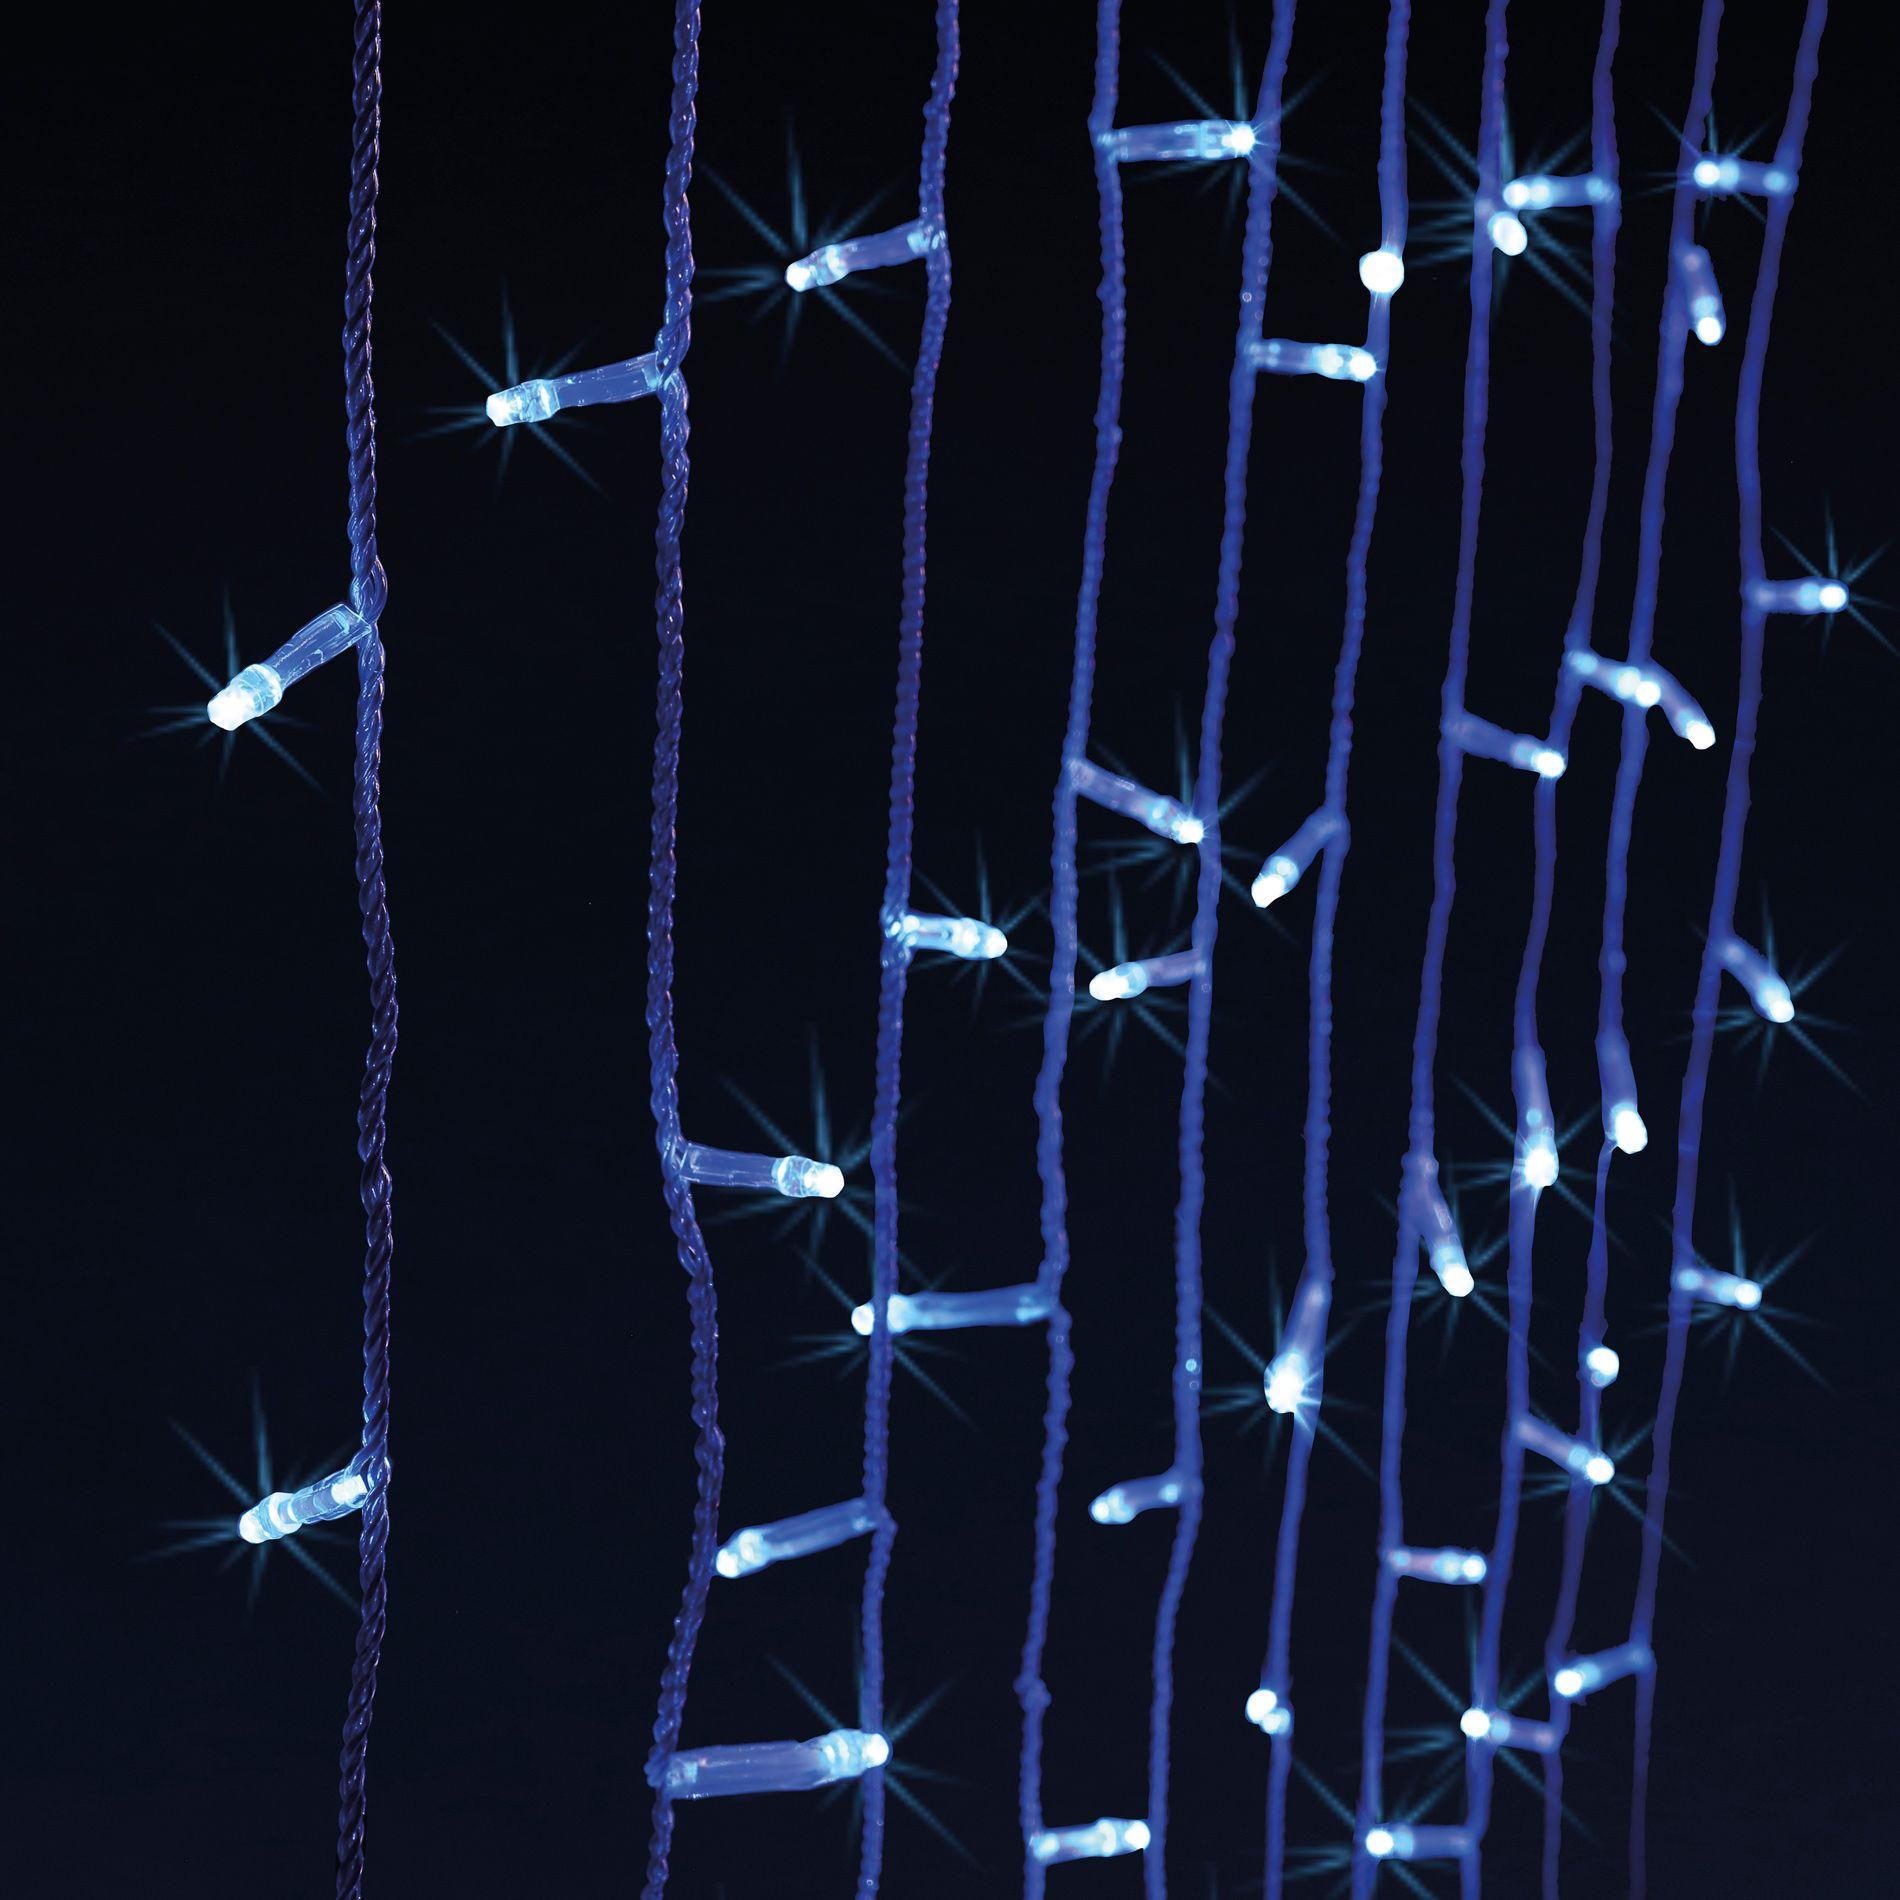 Rideau lumineux h1 90 m bleu 300 led guirlande lumineuse - Rideau guirlande lumineuse ...